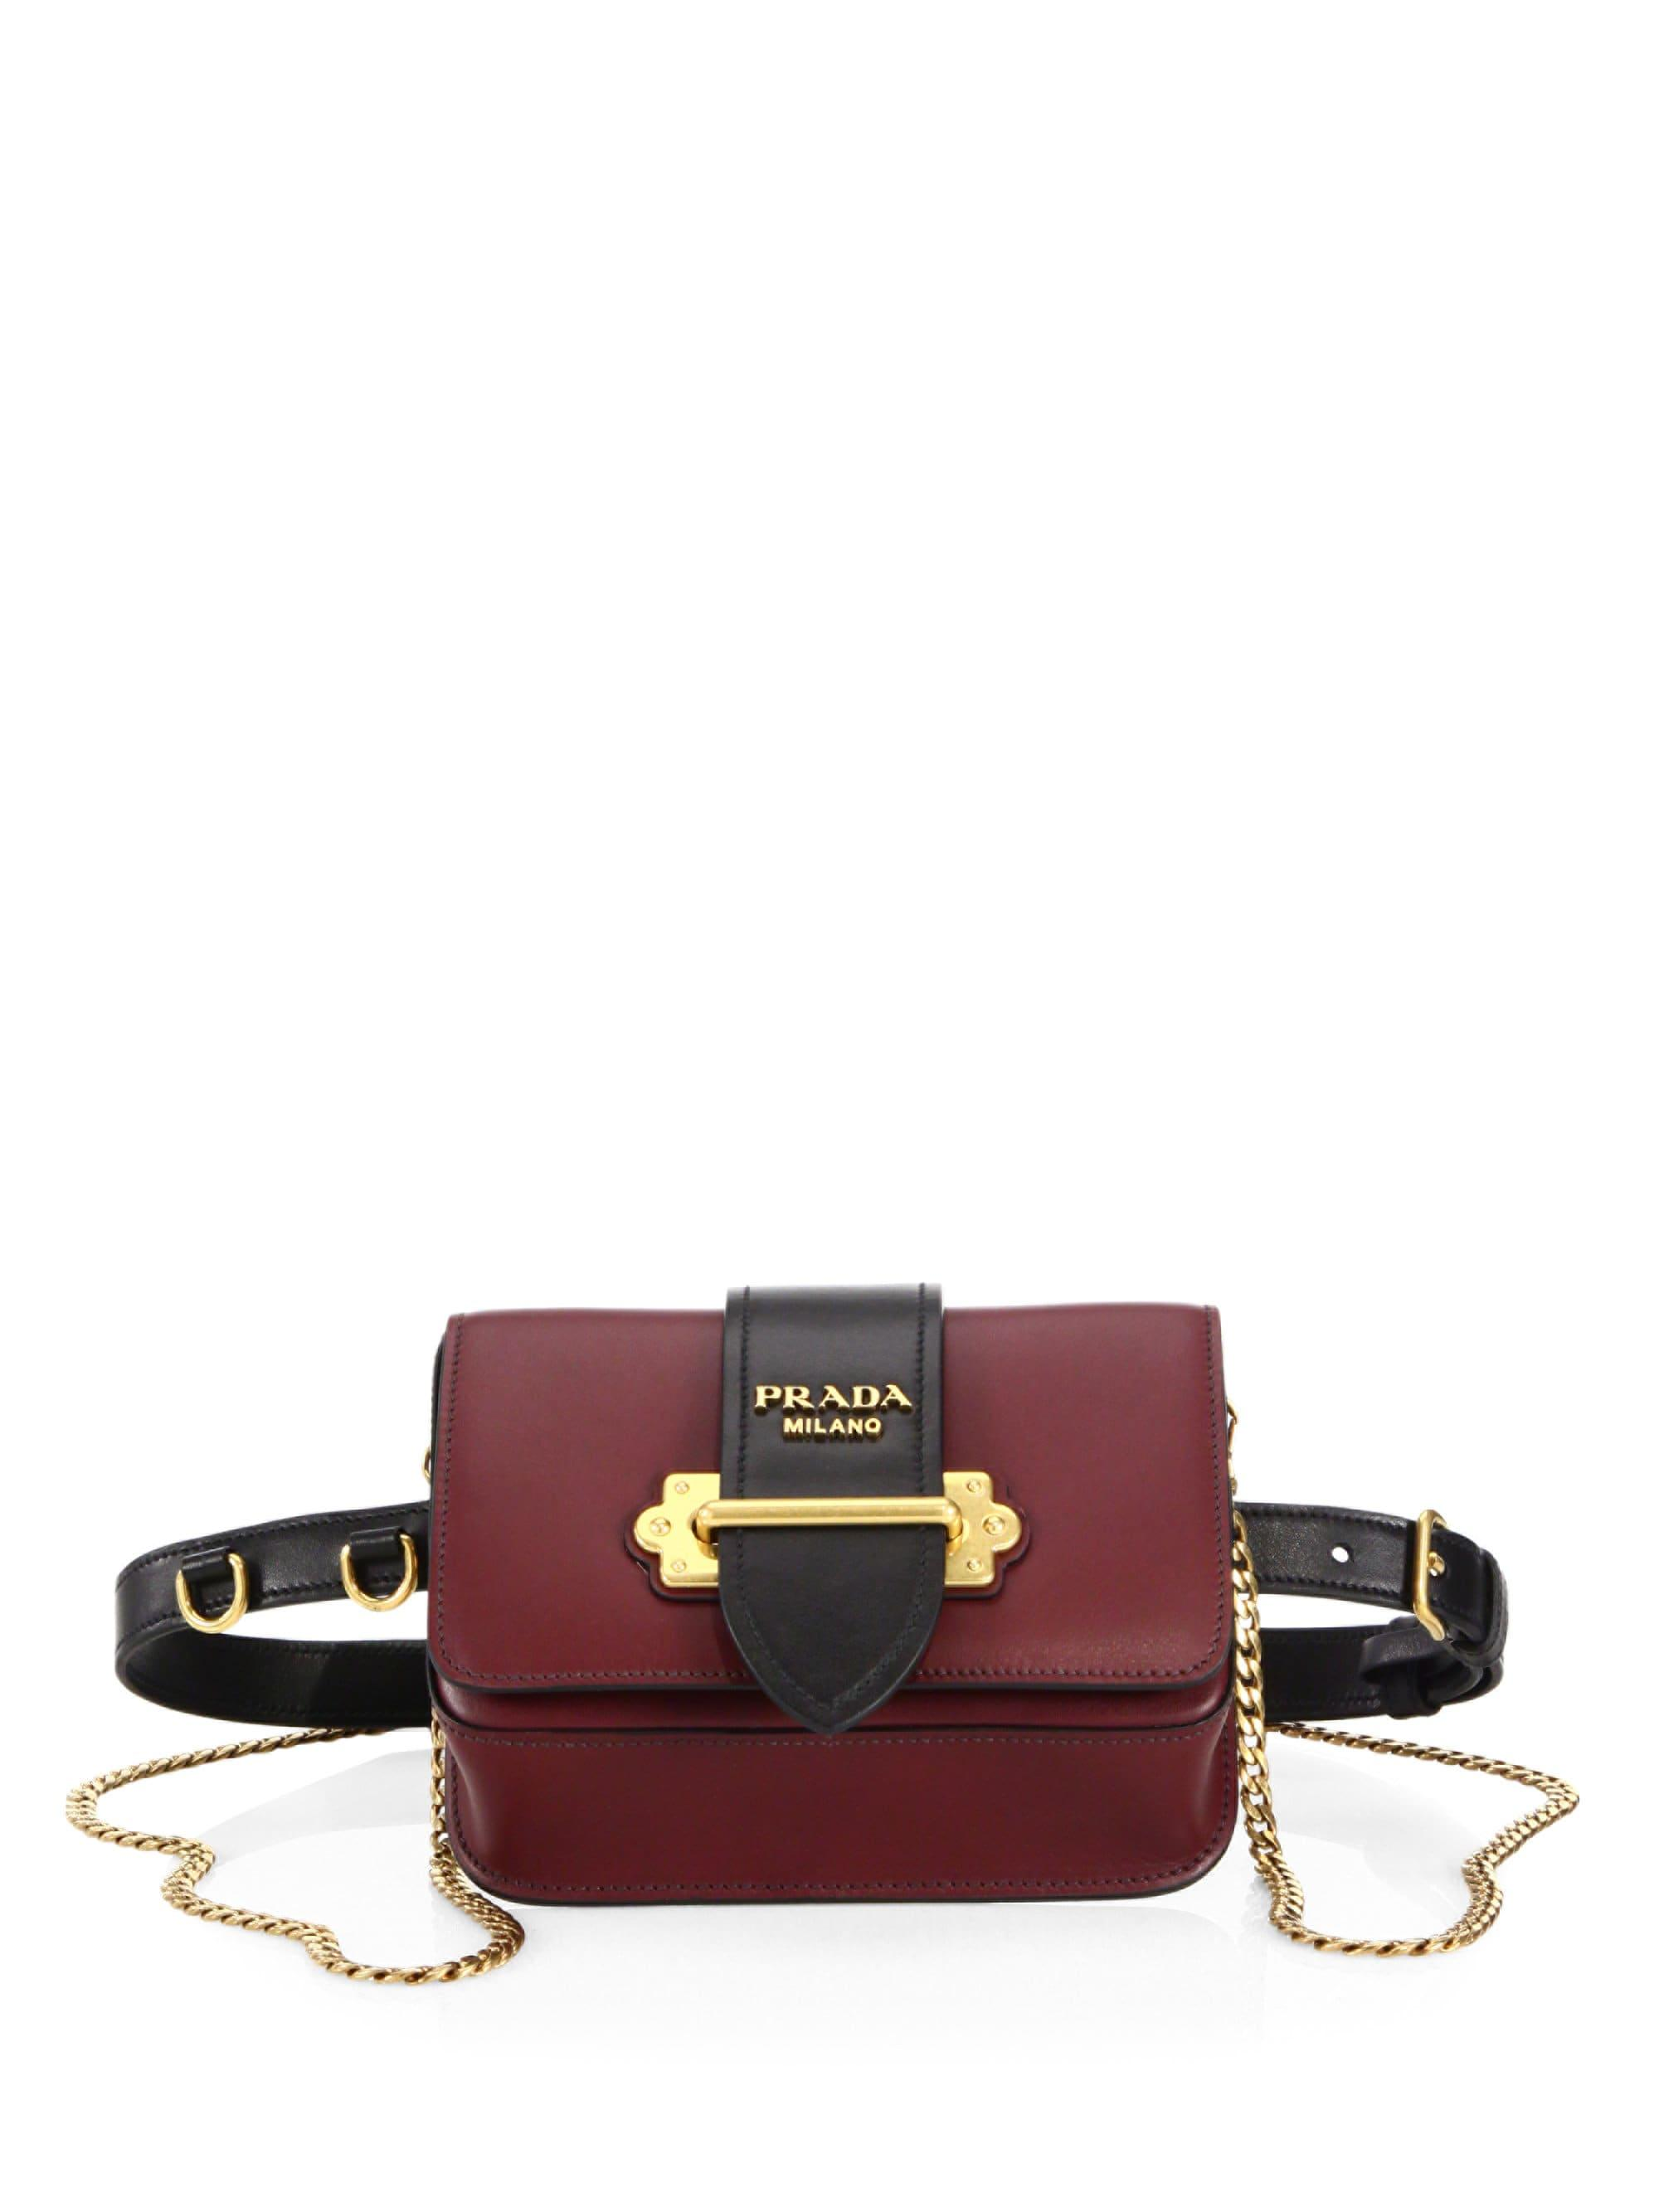 5b8e97595962 Lyst - Prada Marsupio Leather Belt Bag